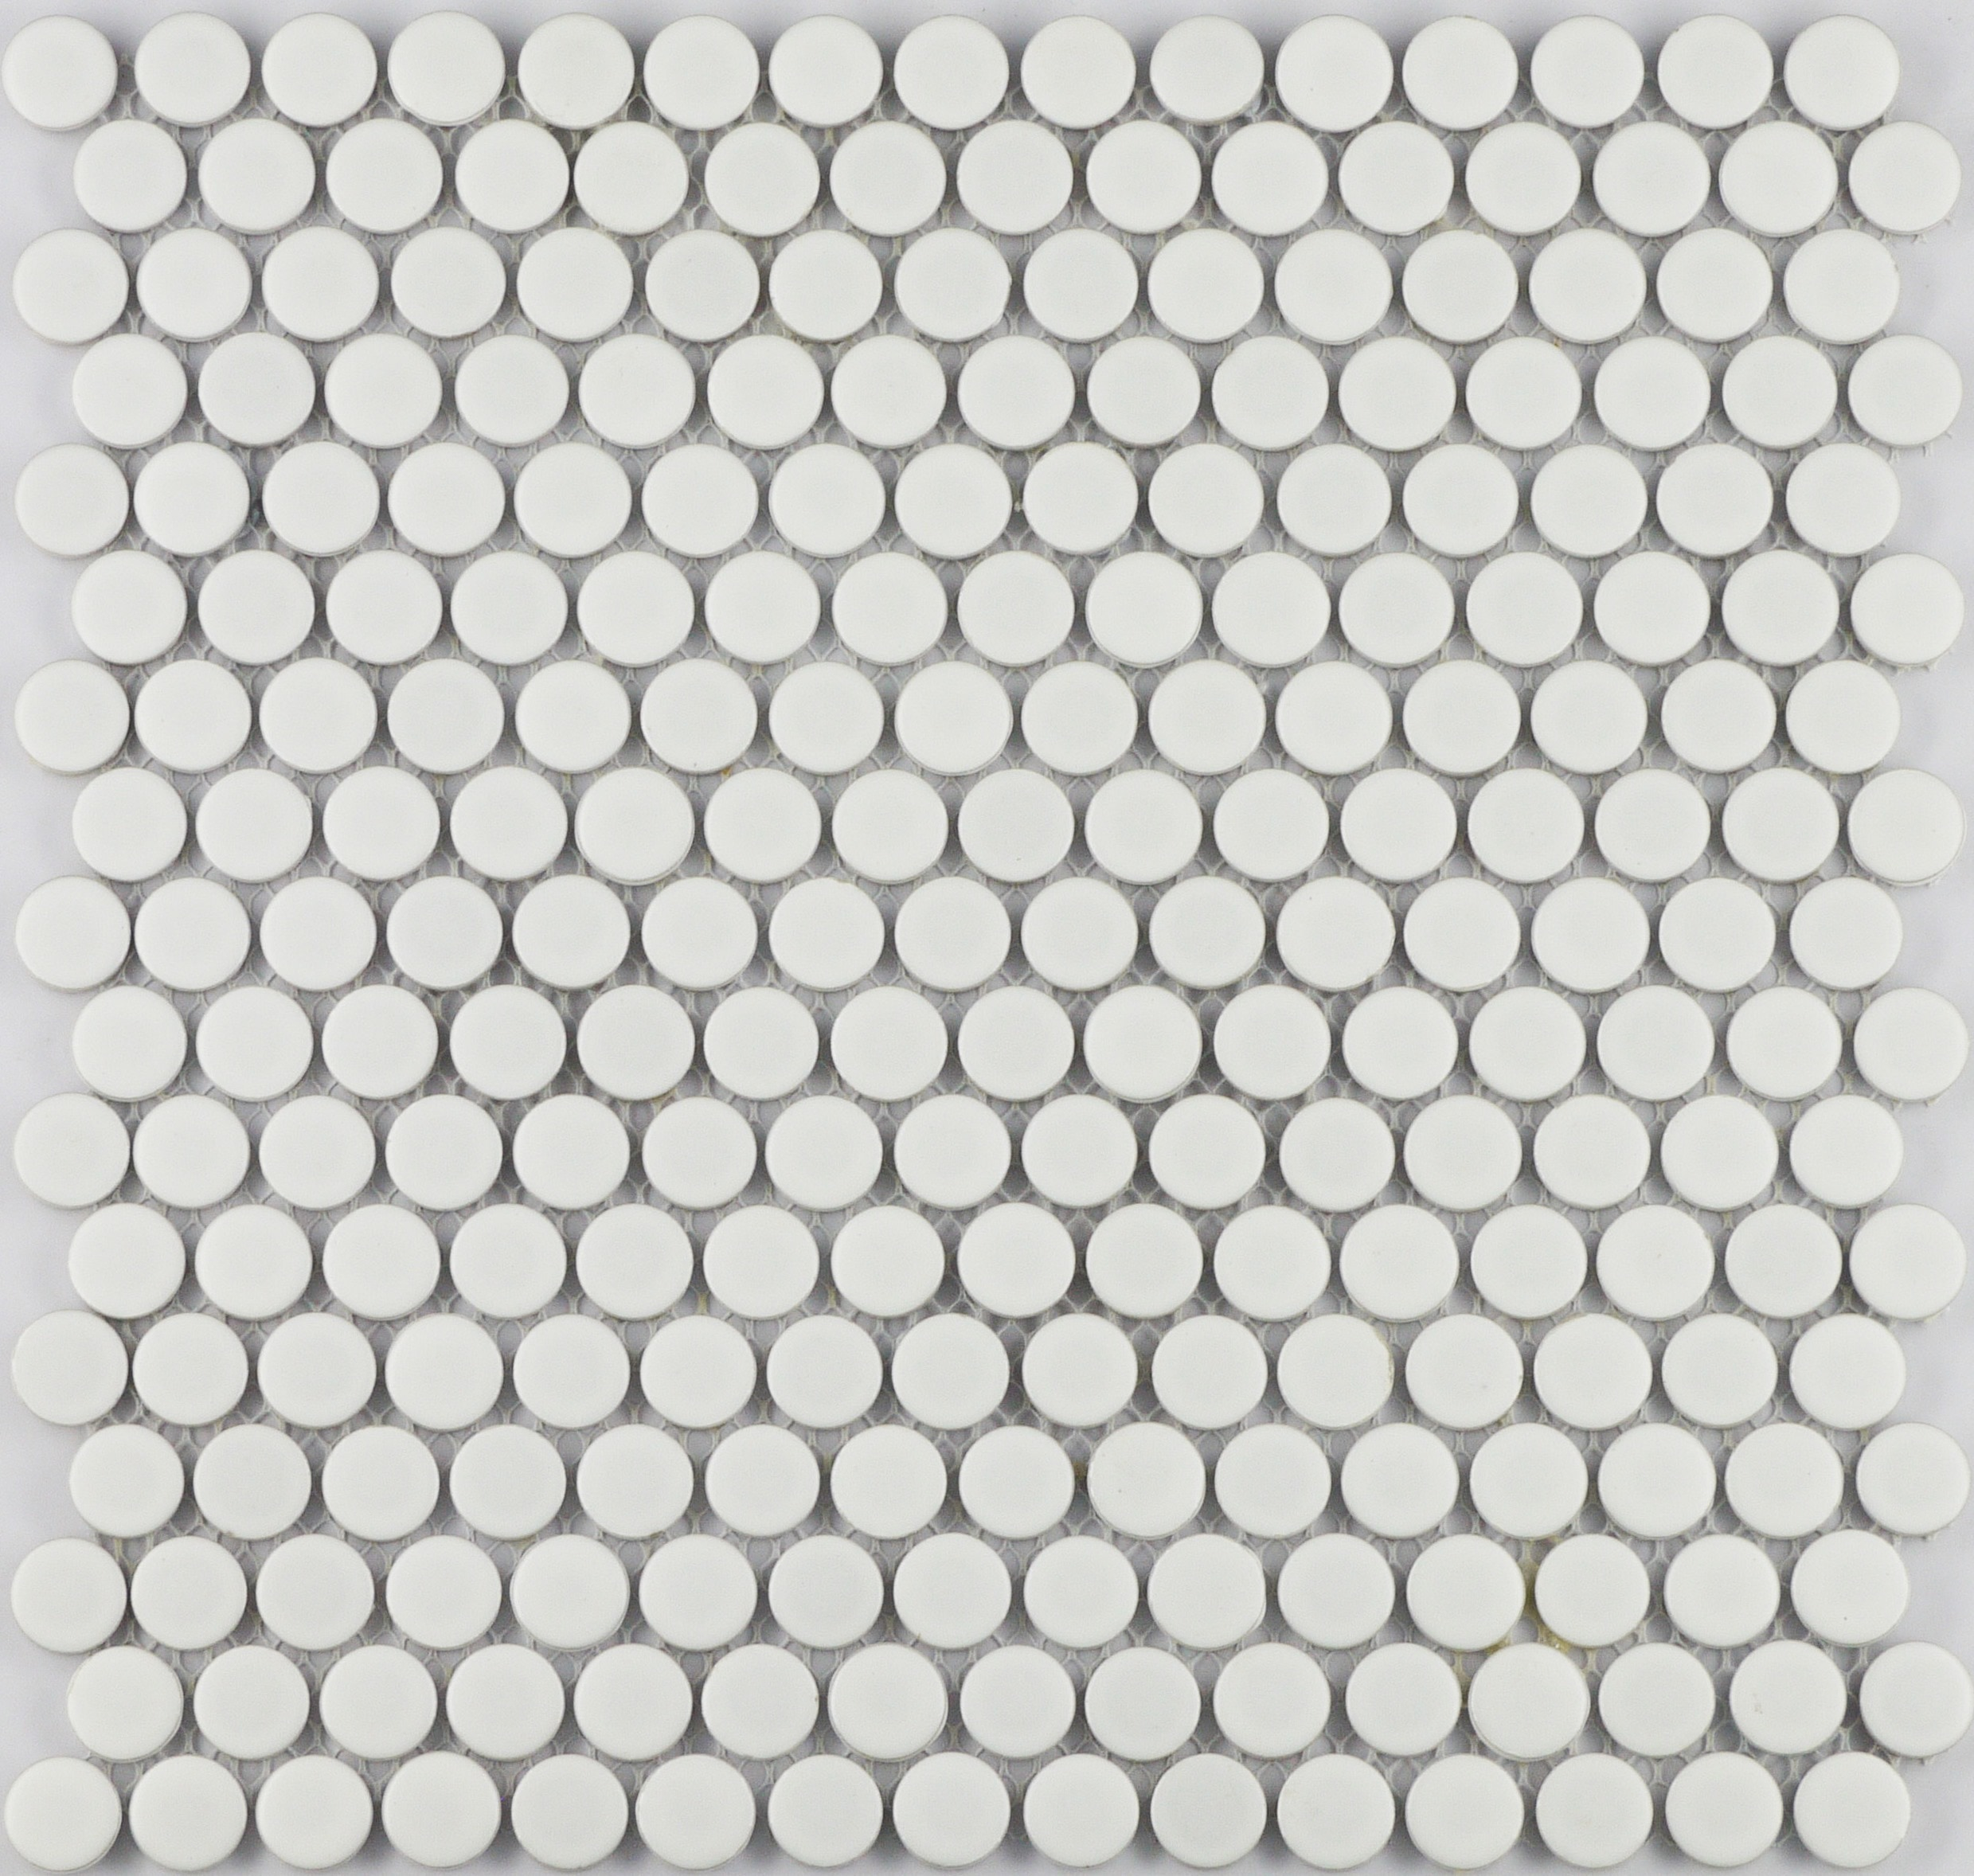 "White Matte Penny / 3/4"" / Matte Finish Porcelain Mosaics Penny Rounds 0"